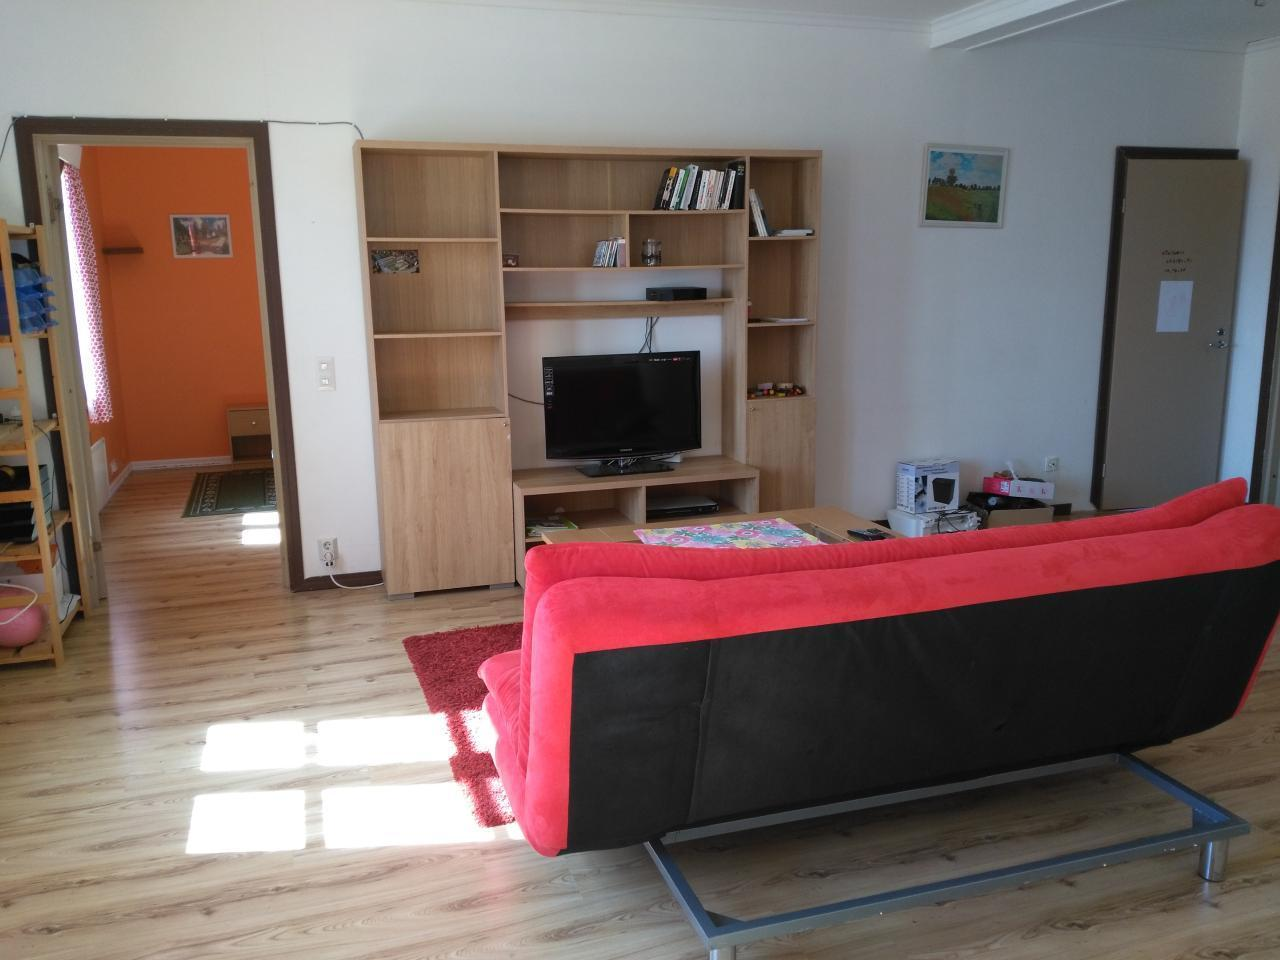 Maison de vacances Urlaub in der schönsten Gegend Finnlands (2177850), Suomussalmi, , Centre de la Finlande - Oulu, Finlande, image 11